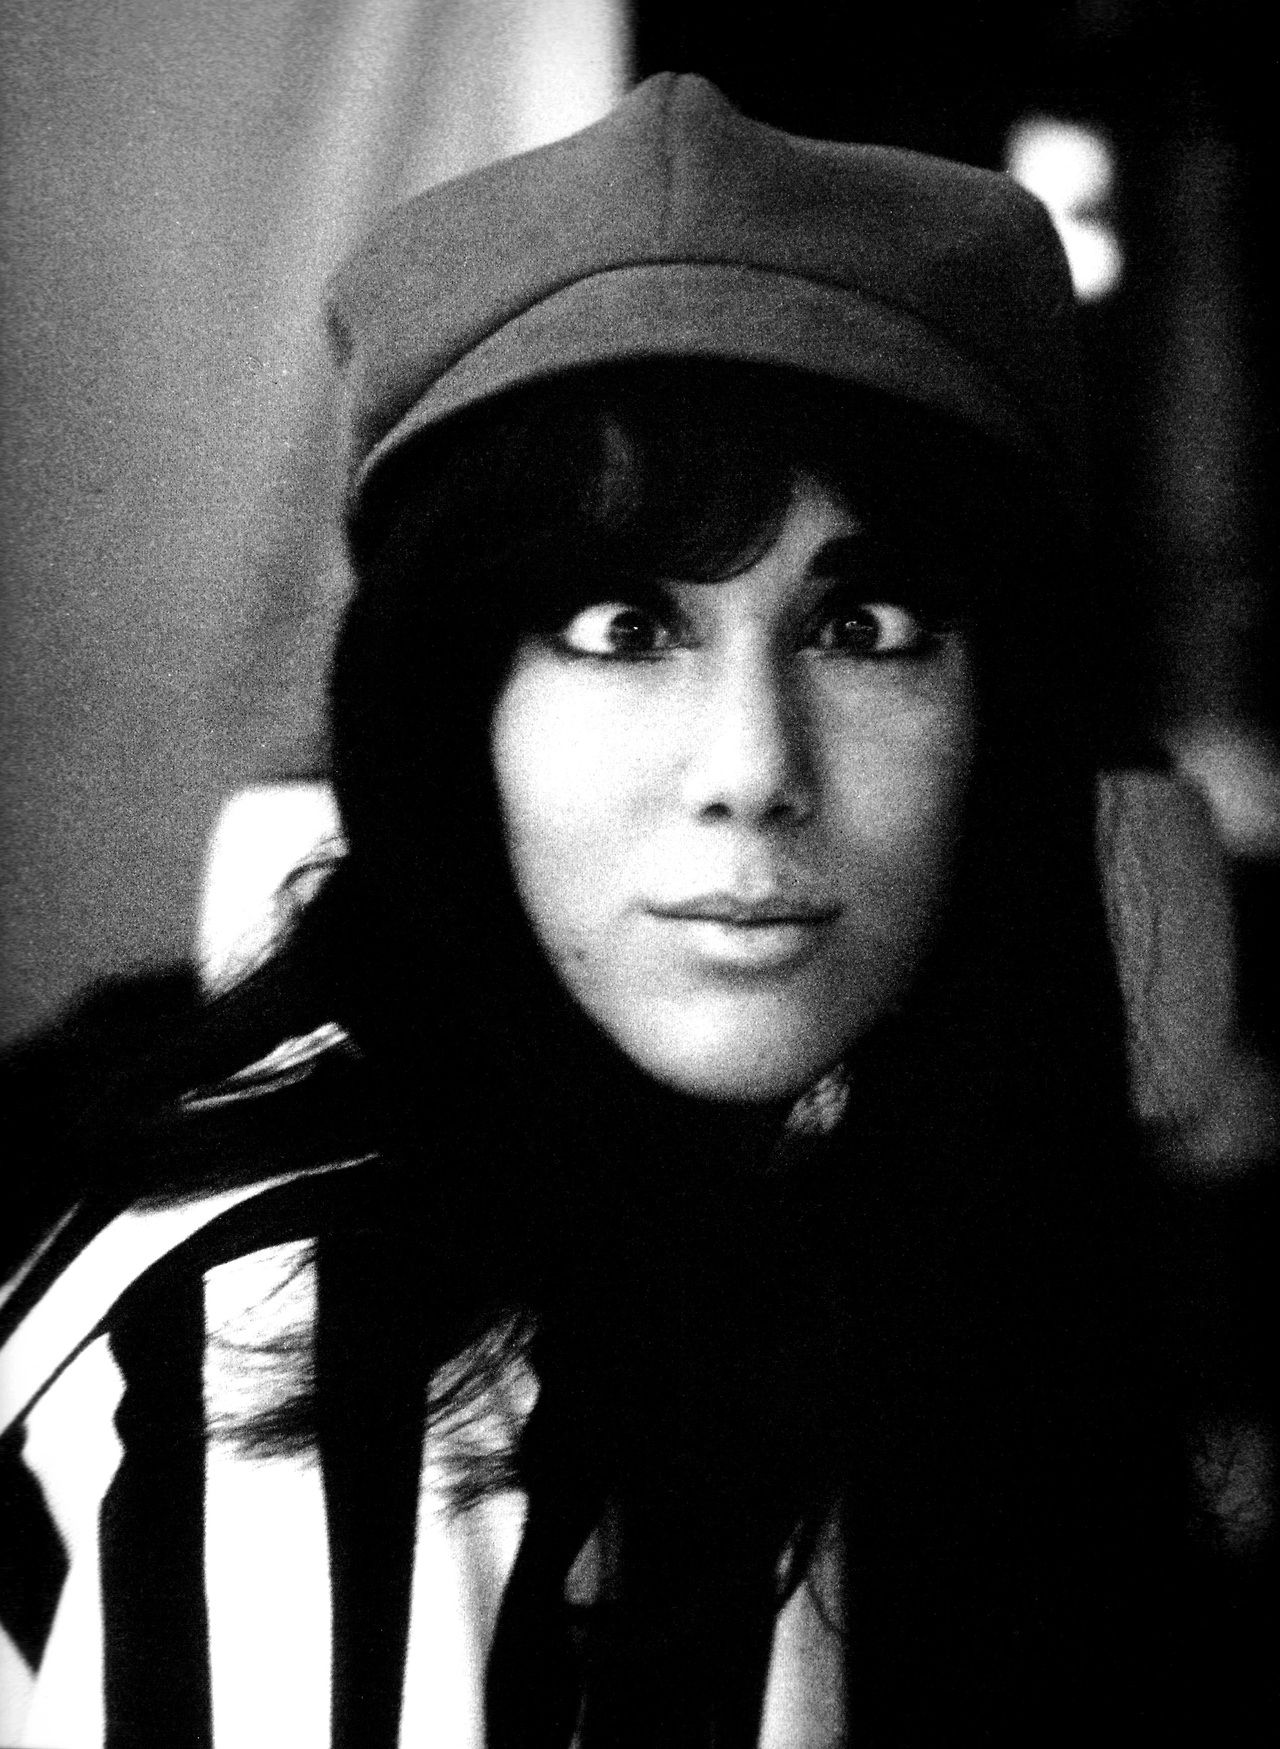 Cher — photo by Sammy Davis Jr.